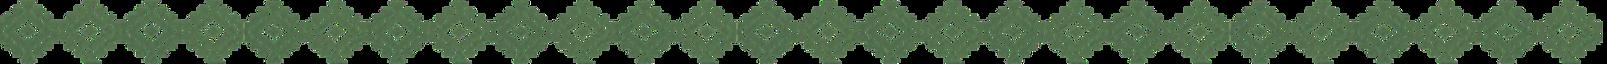 GRAFISMO_SIM%C3%95ES_edited.png